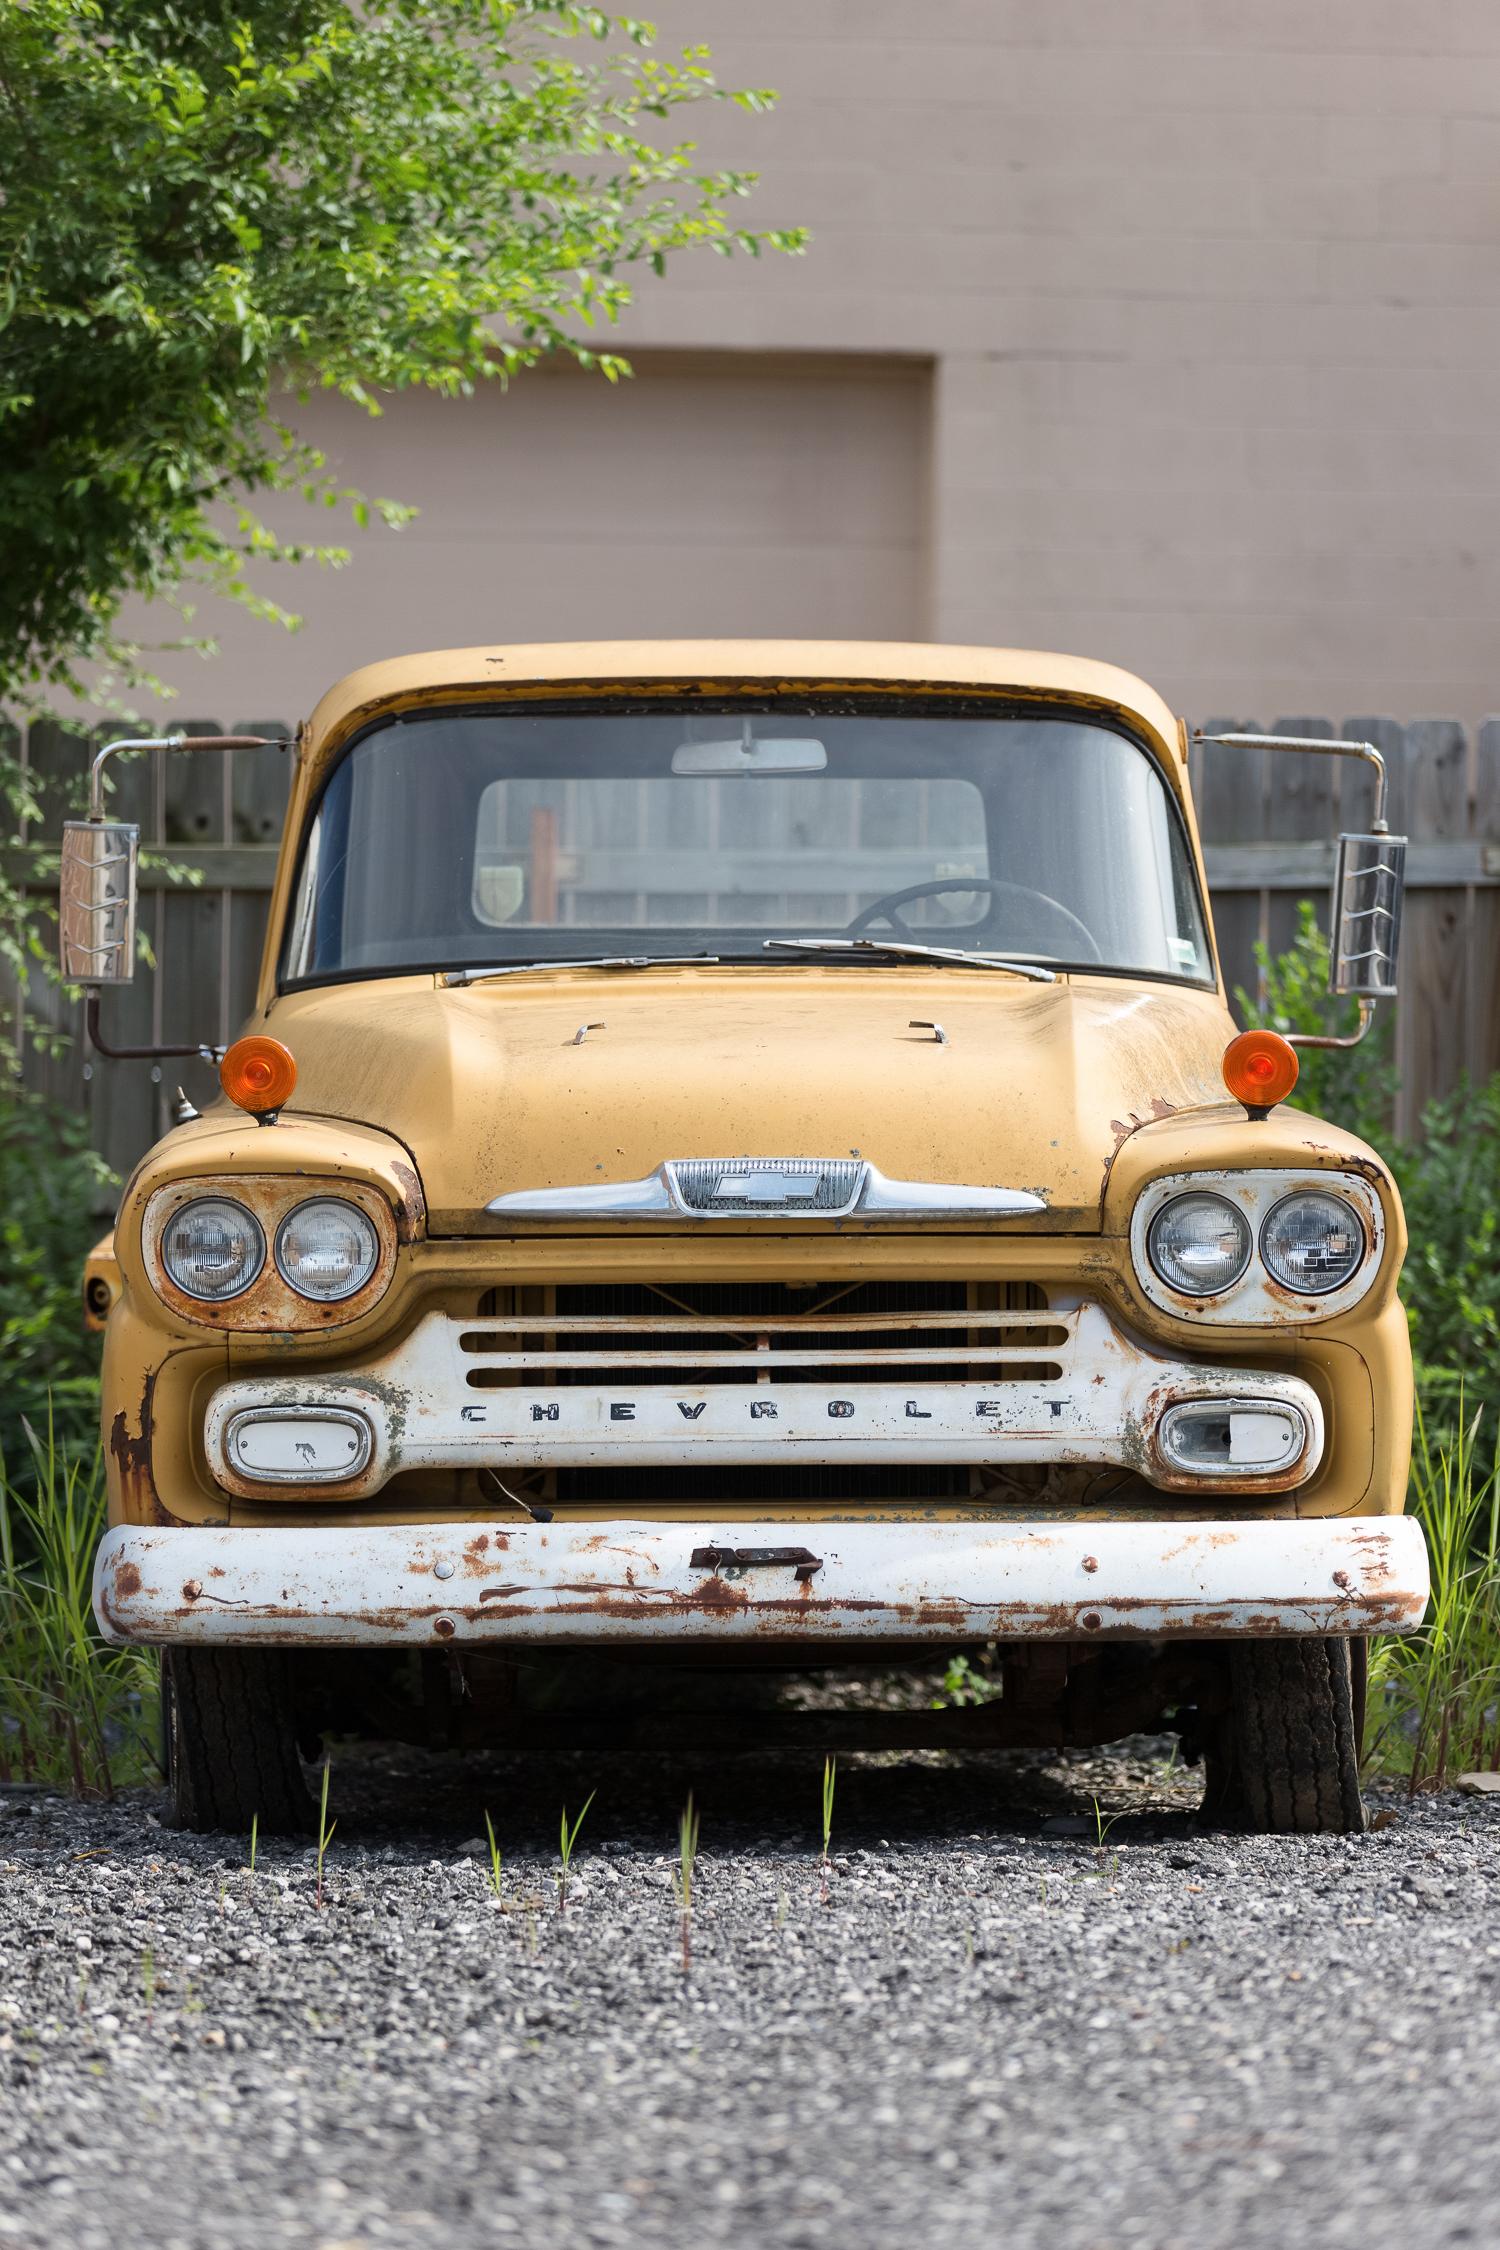 yellow 1958 chevrolet truck rusty truck | Anthem Photography | wwww.anthem-photo.com | 001.jpg